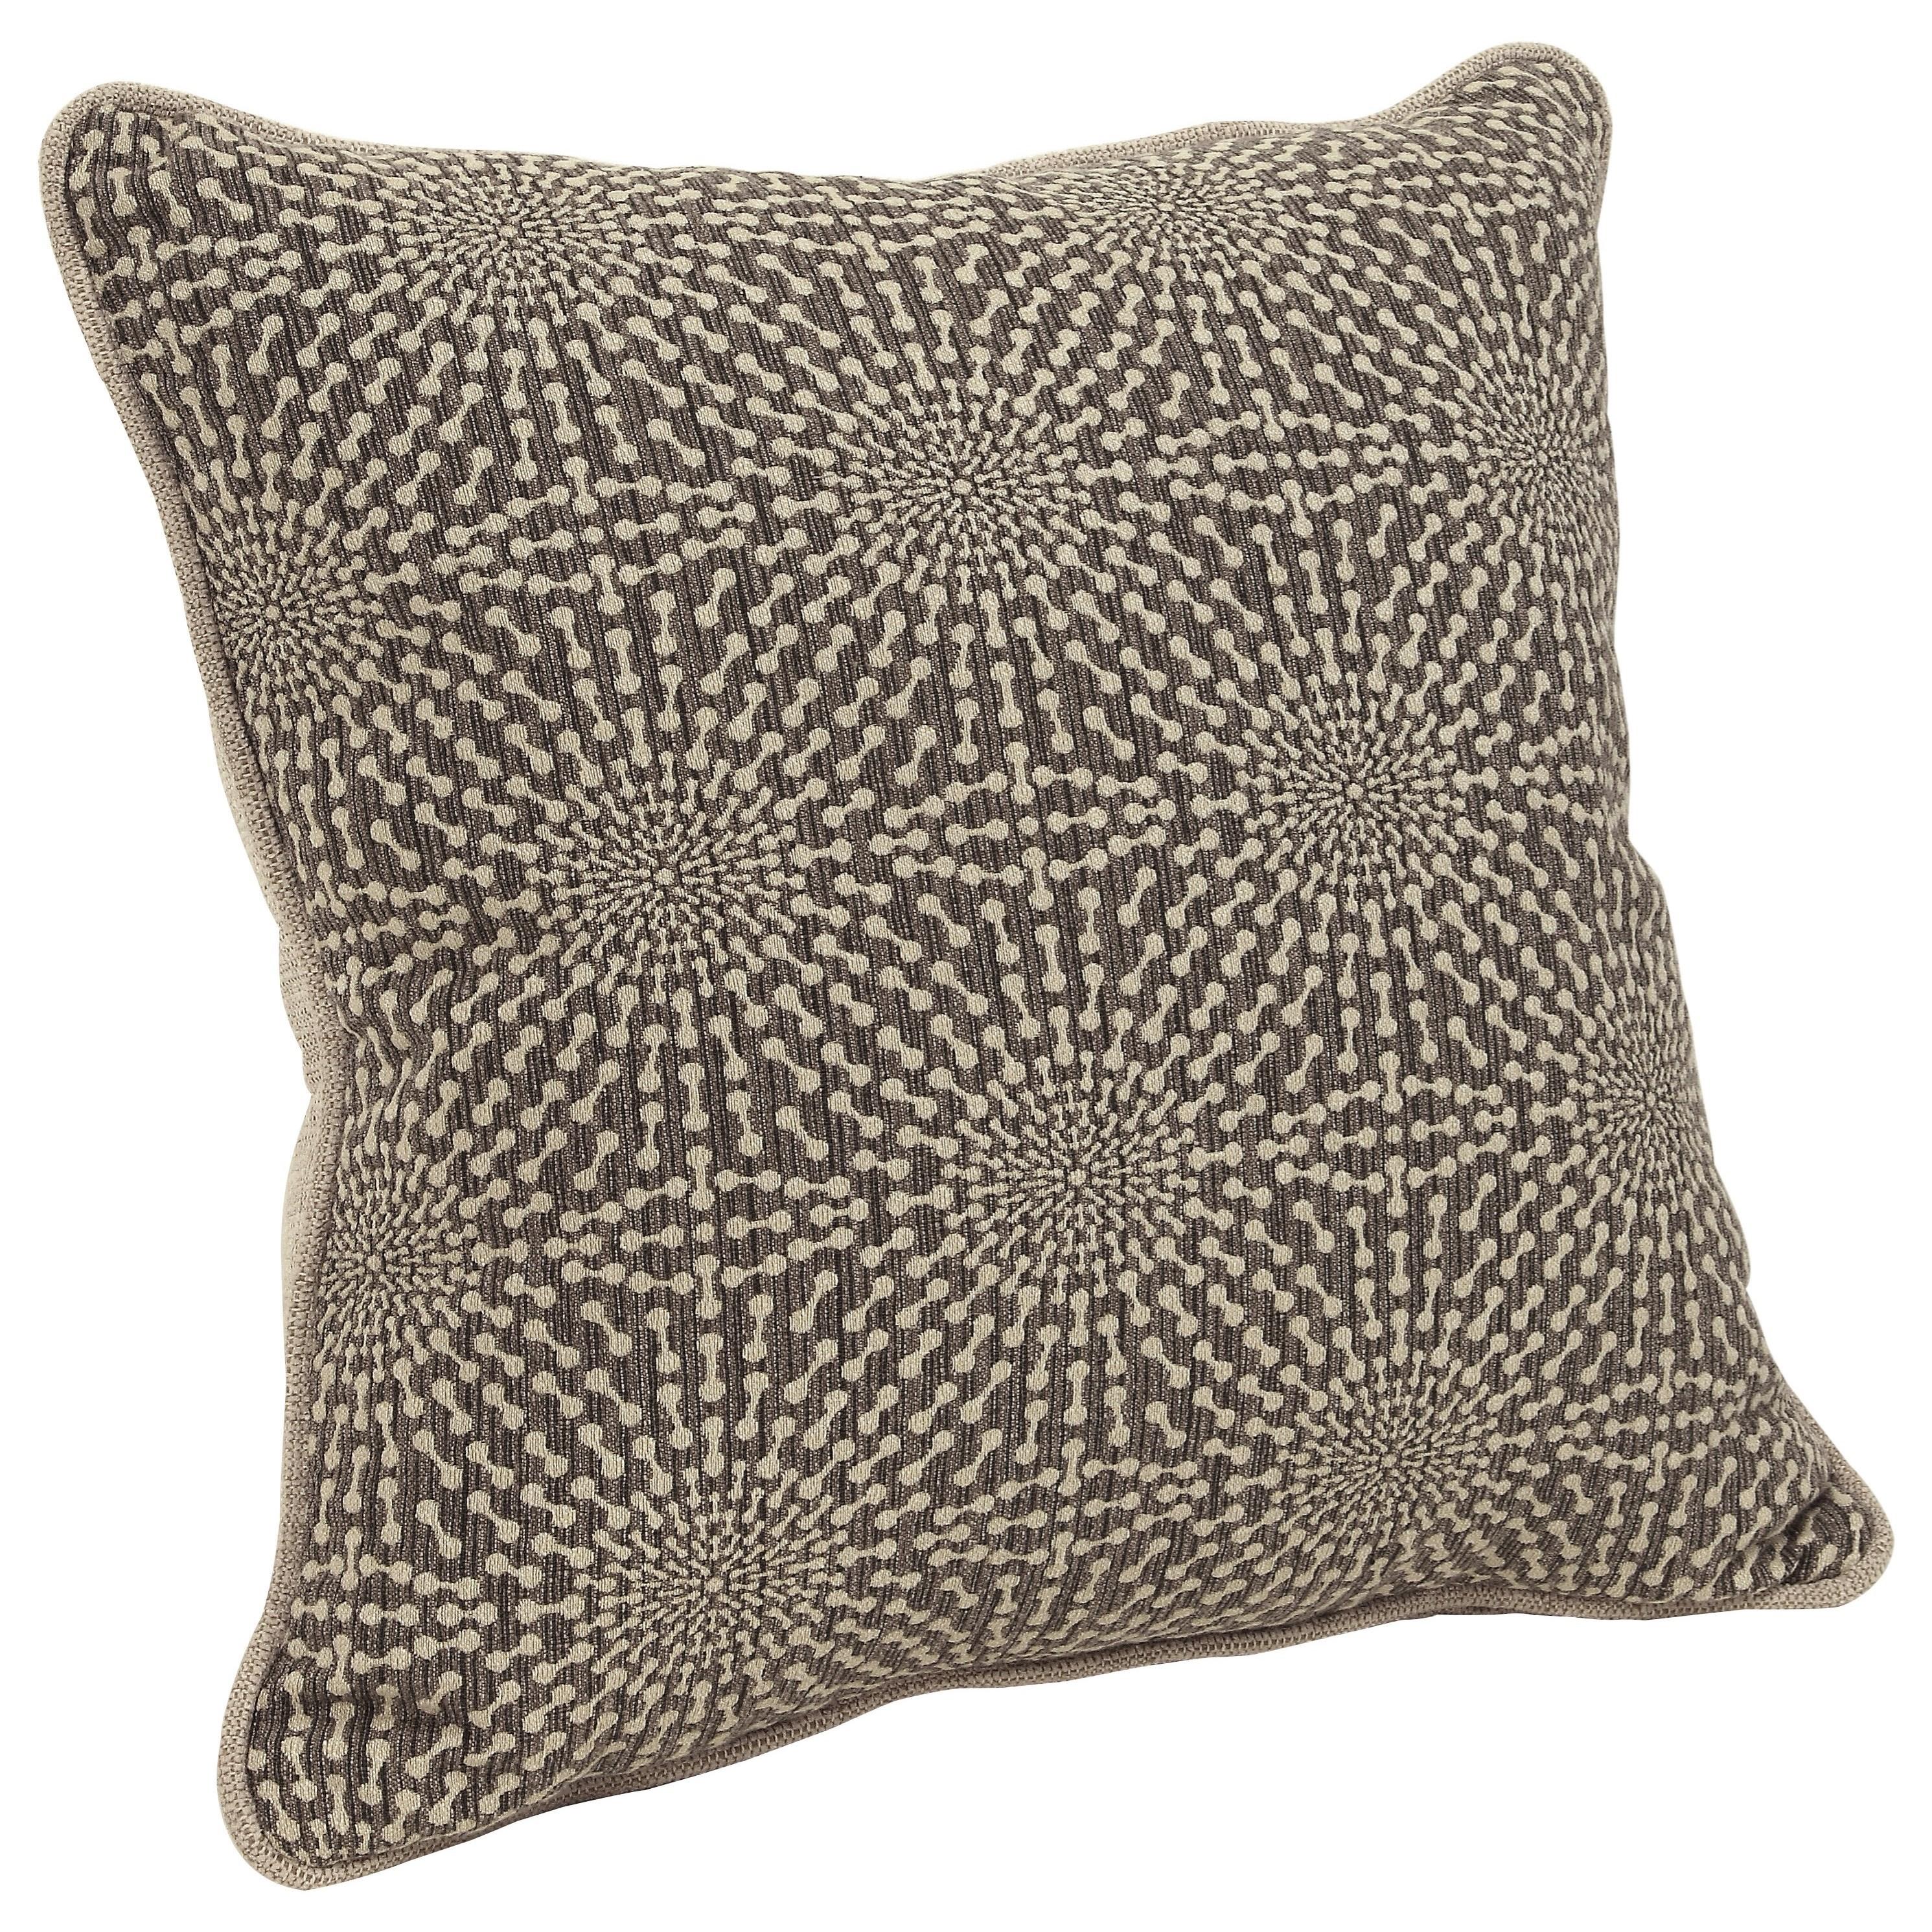 Loose Pillow Back Sofa: Lyonesse Sofa With Loose Pillow Back Cushions